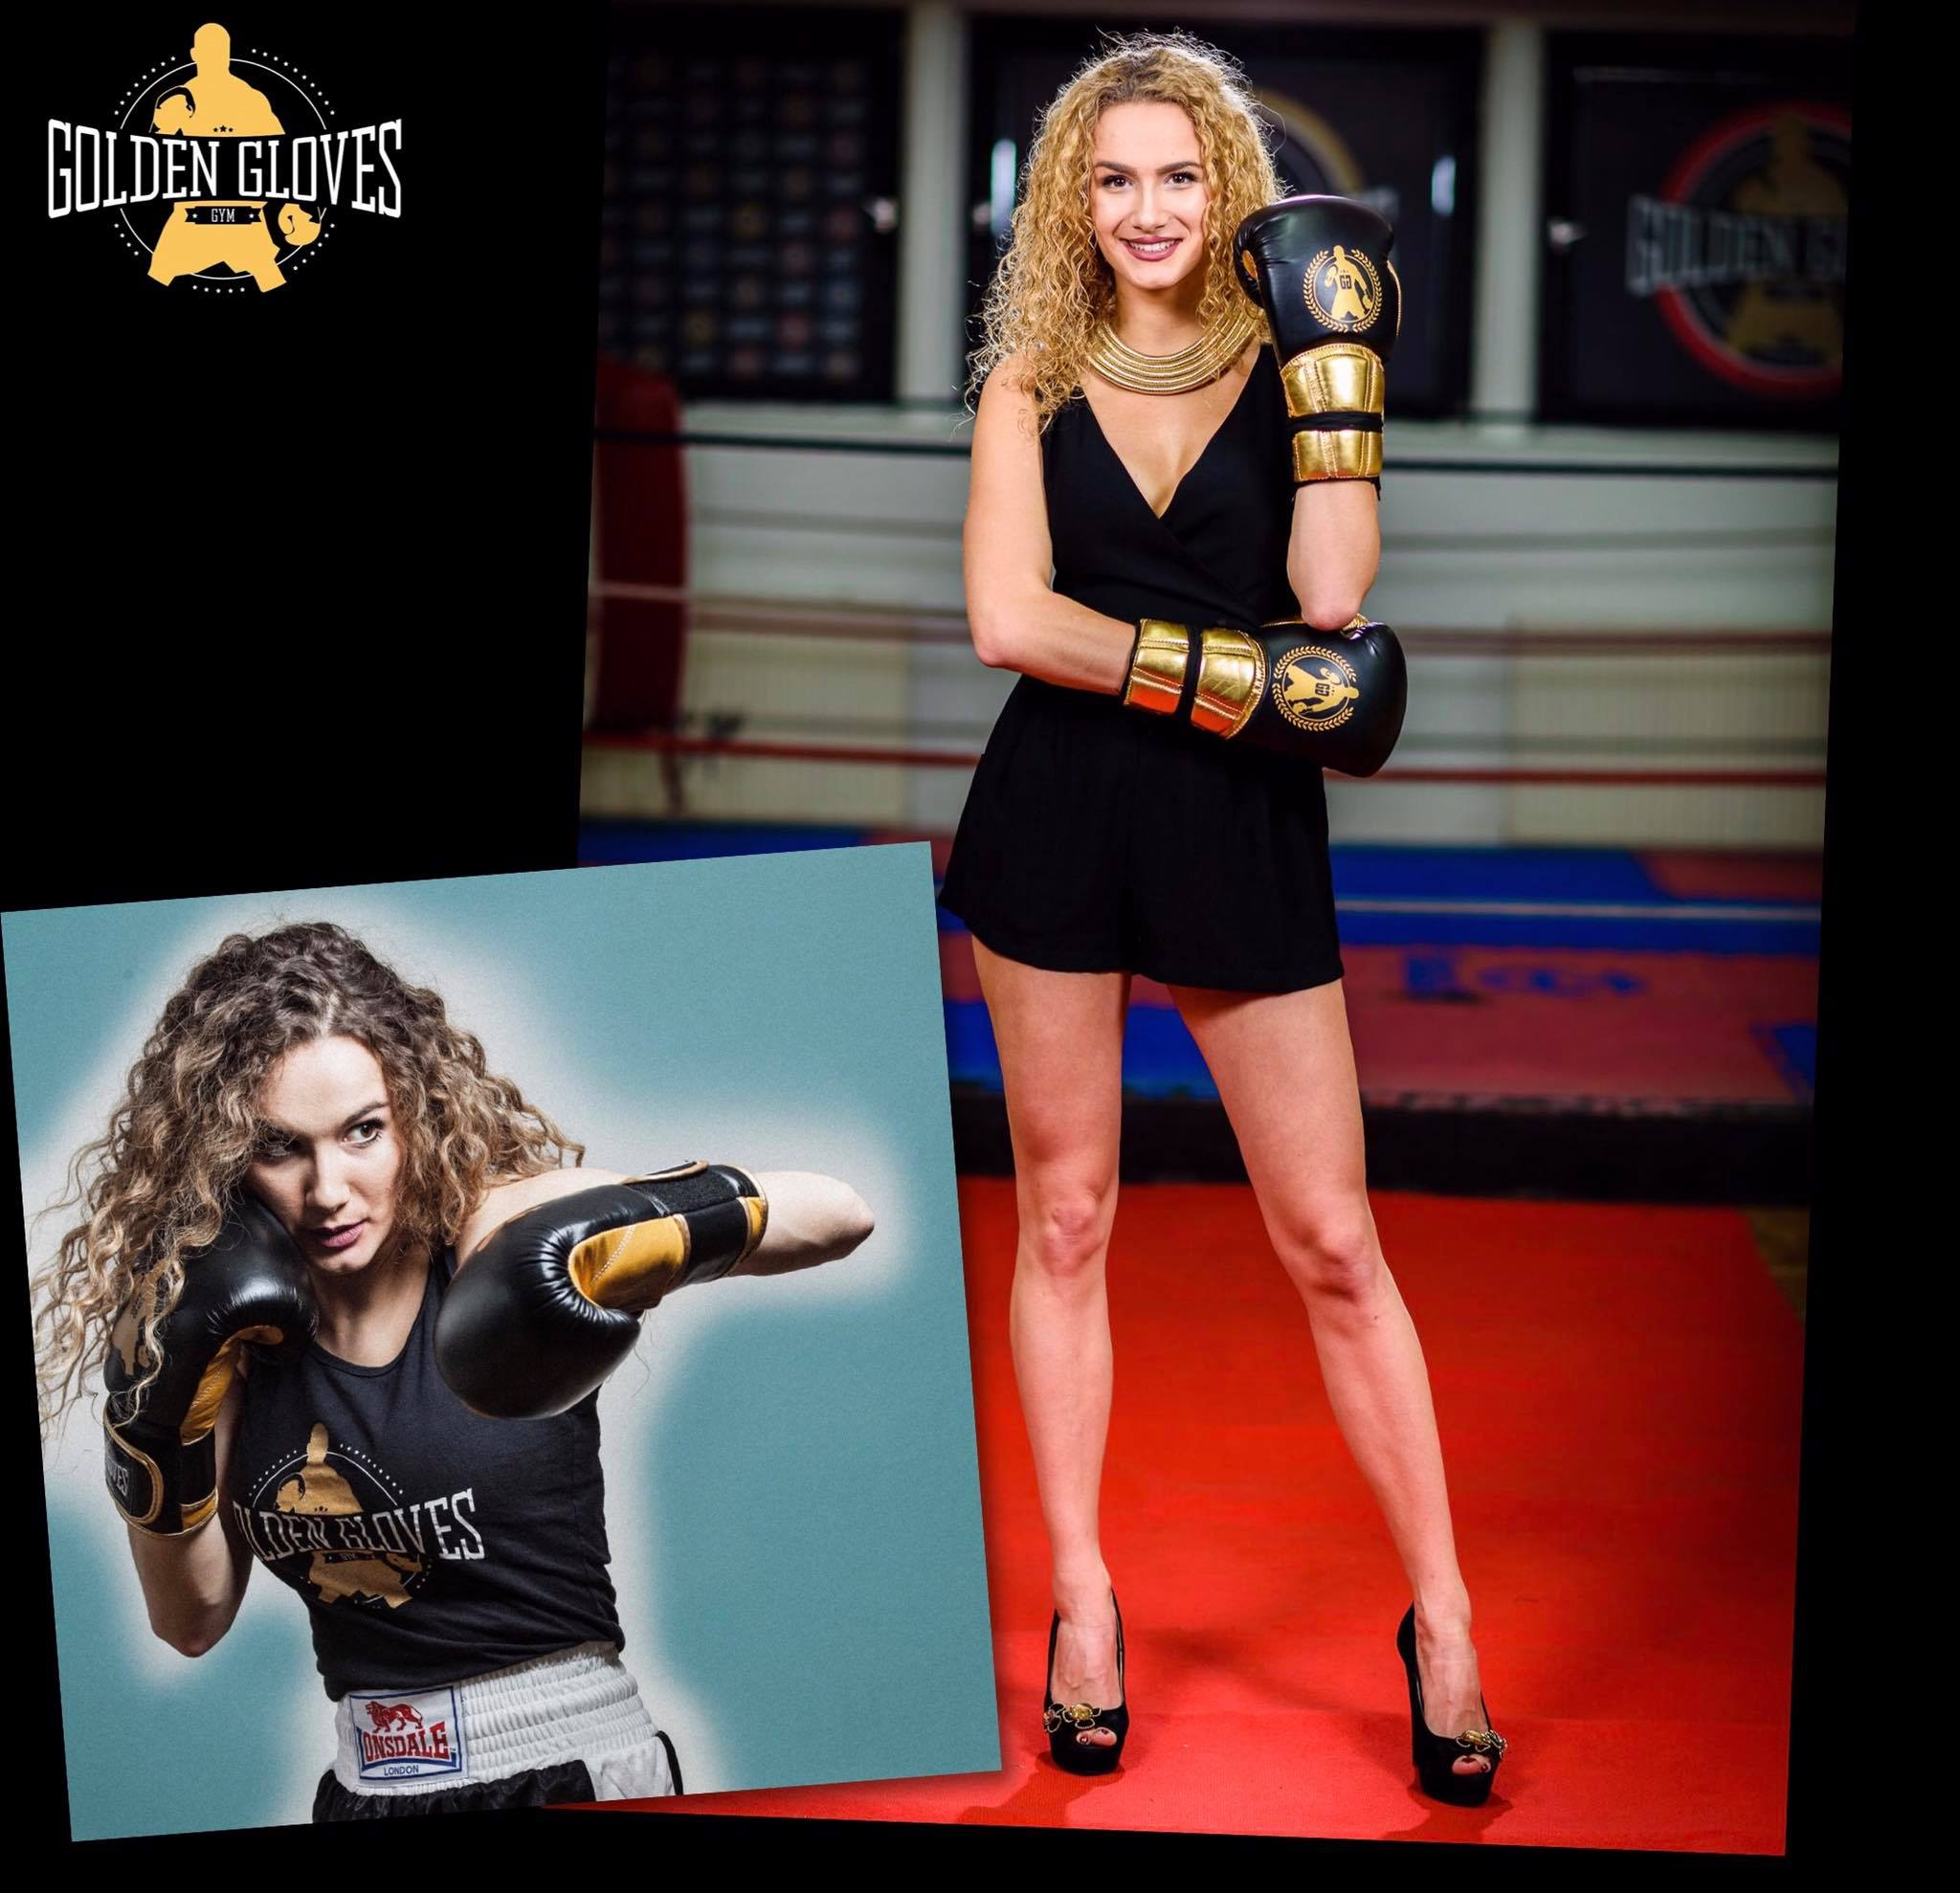 Golden Gloves Fitness Vaughan: 6. KOLO SLOVENSKE BOKSARSKE LIGE